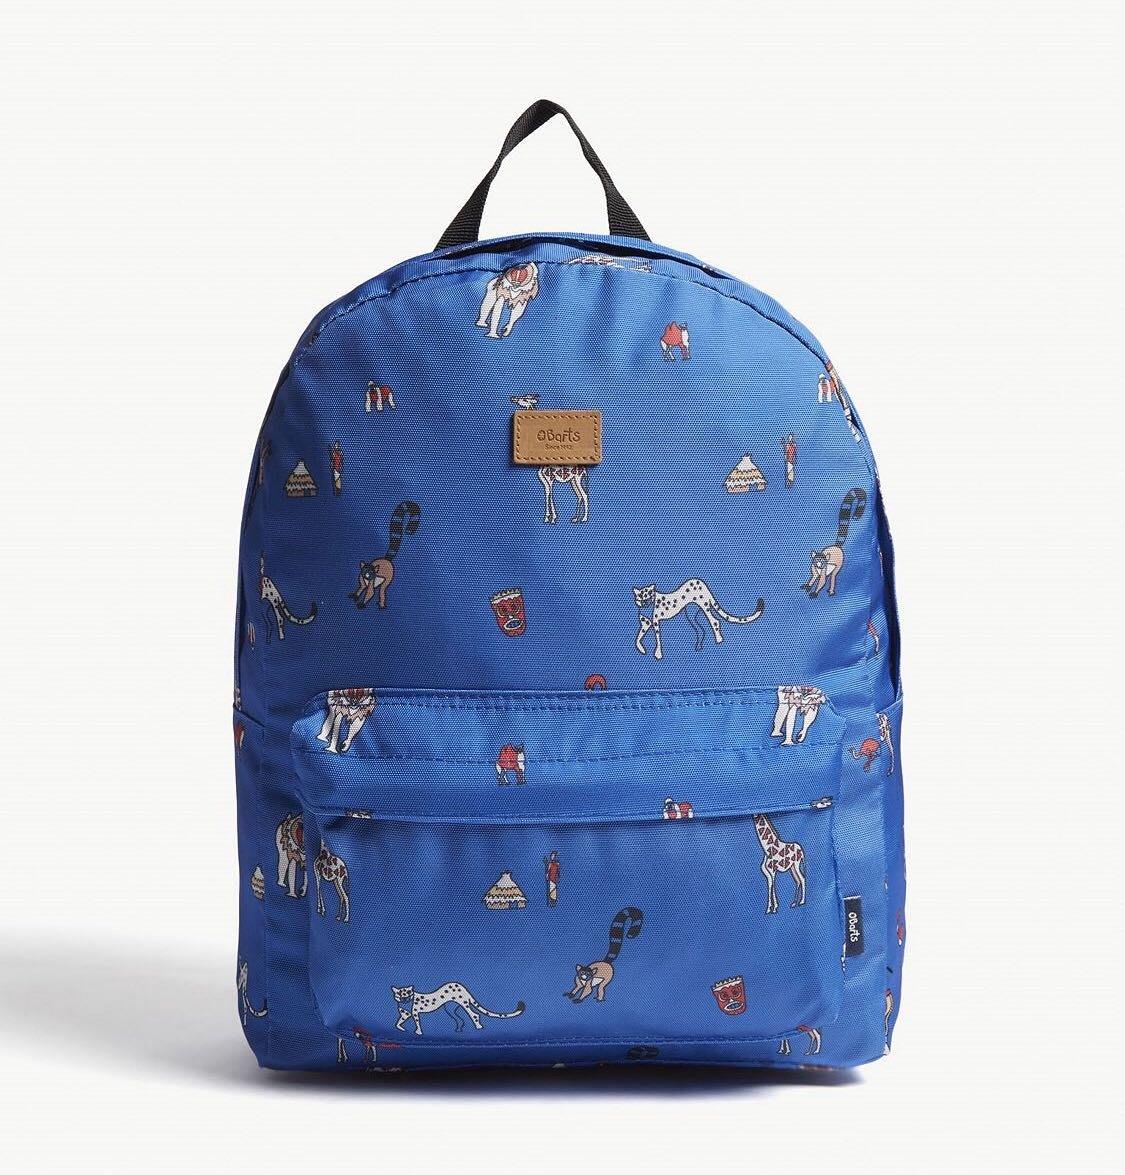 荷蘭BARTS BV Dolphin backpack 動物圖騰後背包 (預購)